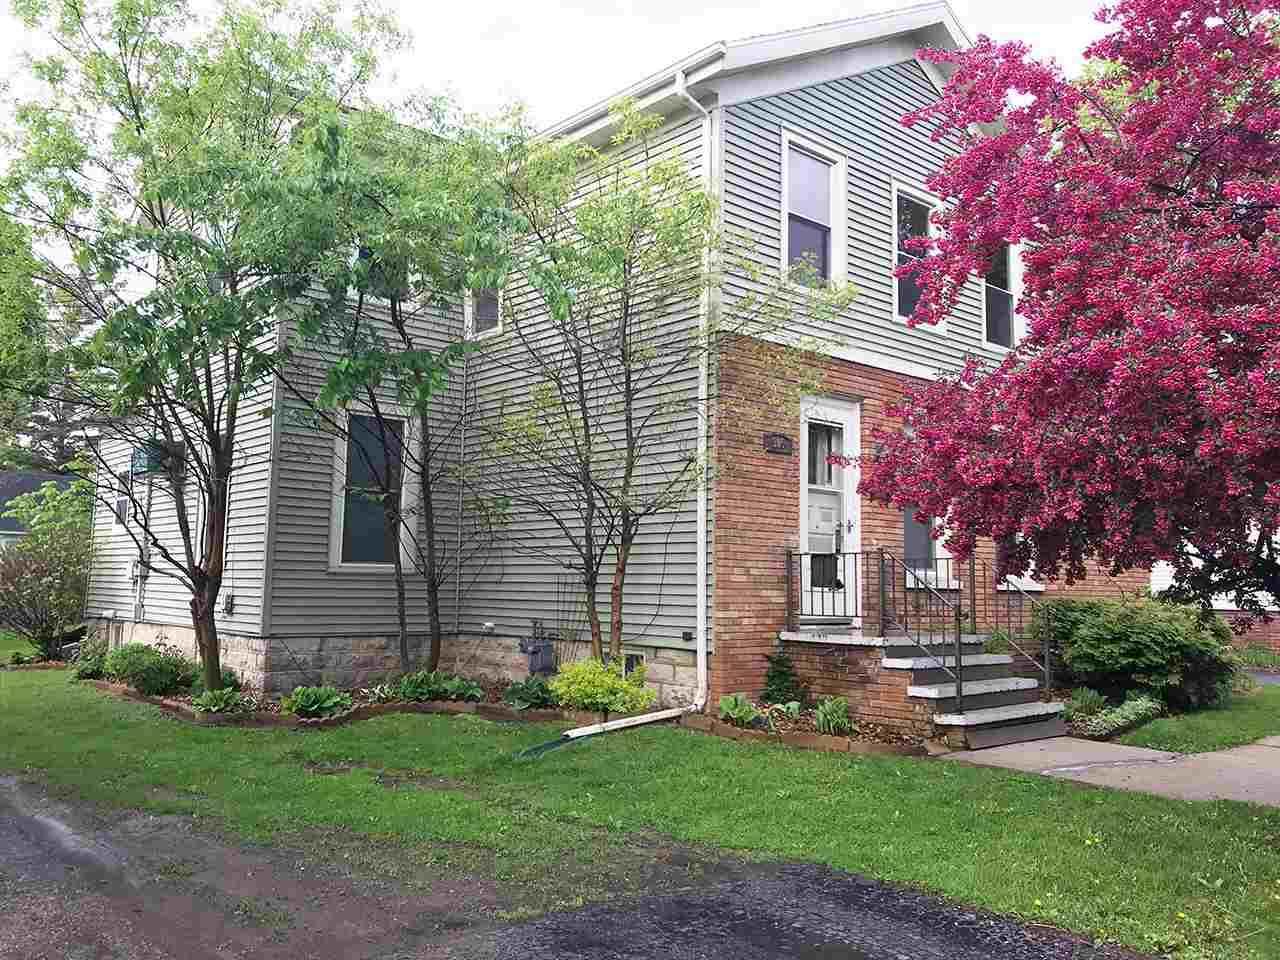 305 Park Ave - Photo 1